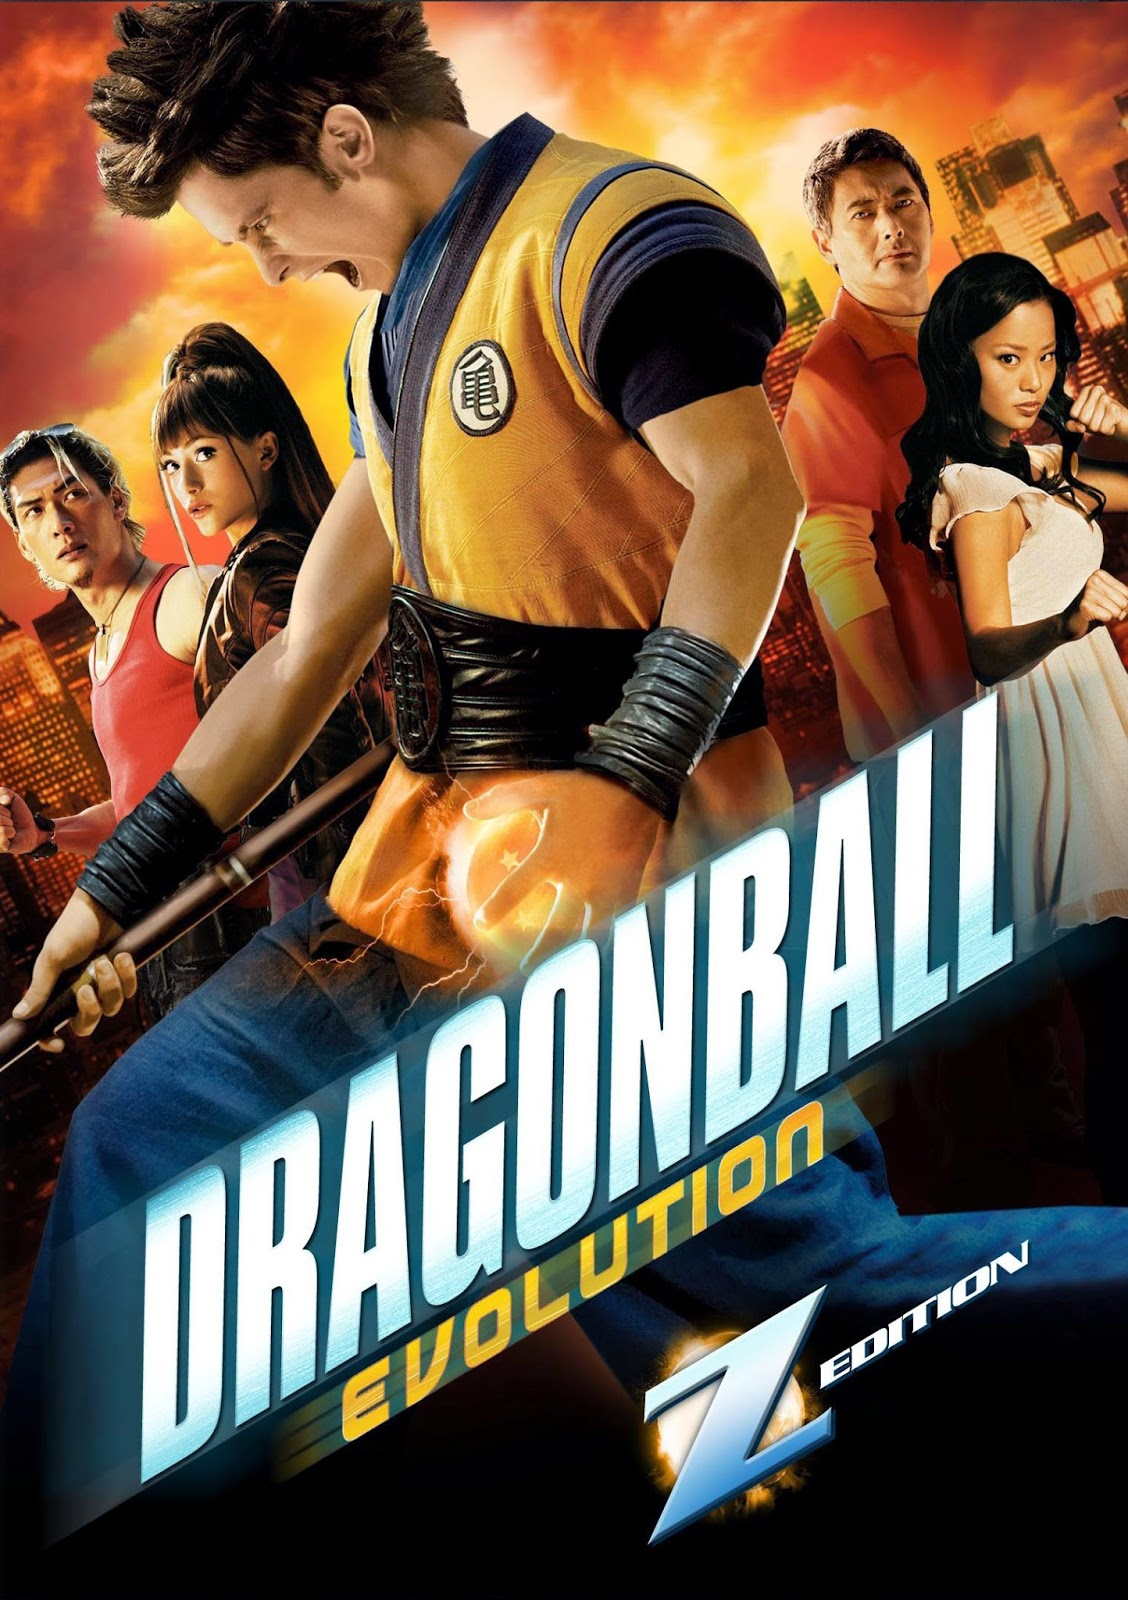 Download Dragonball Evolution (2009) BluRay 720p